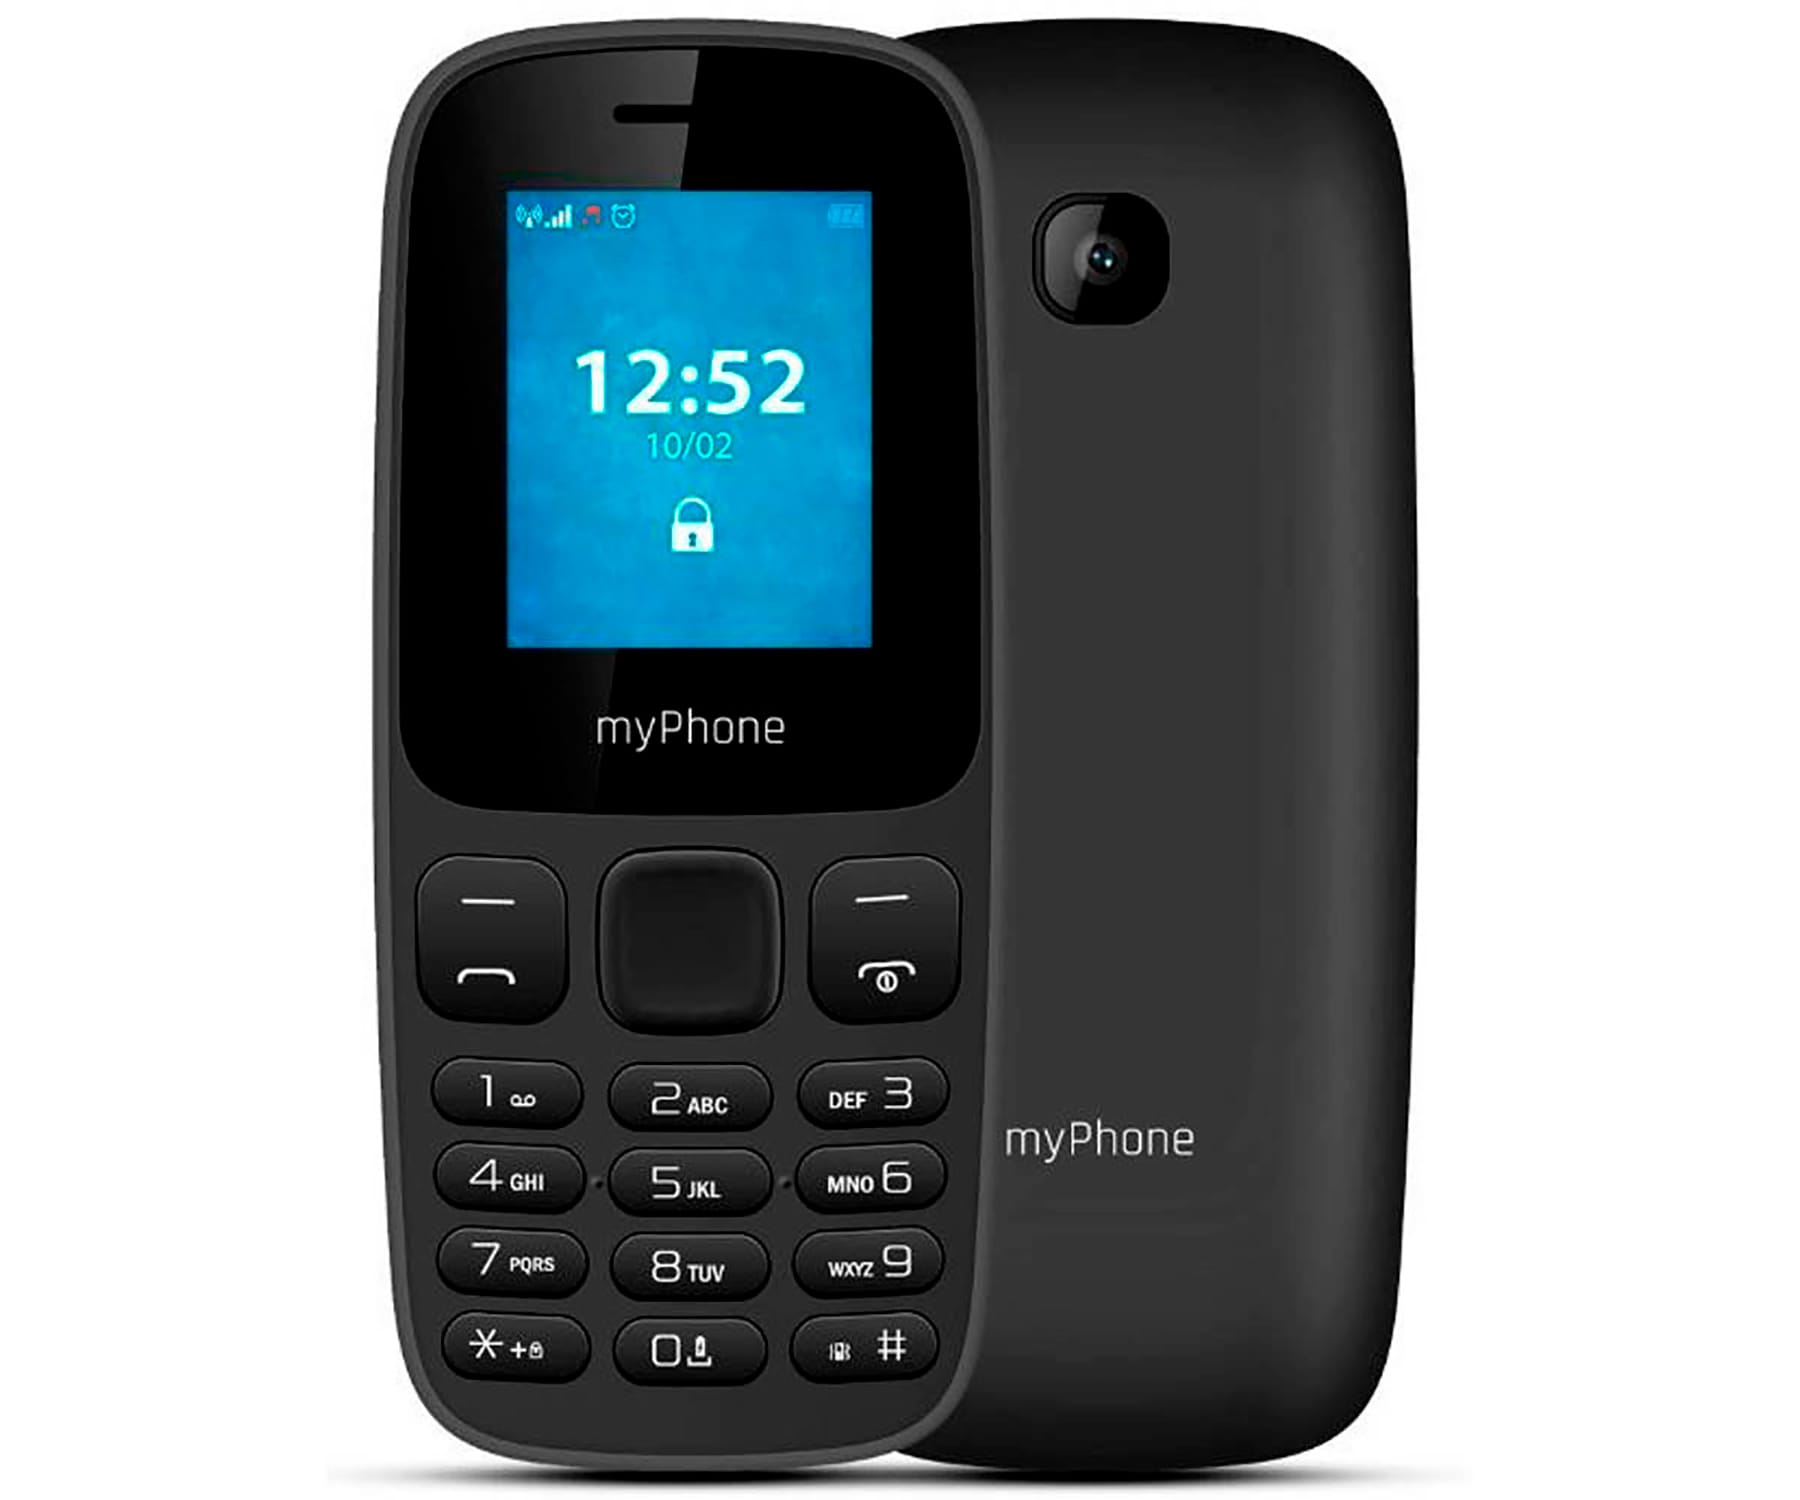 MYPHONE 3330 NEGRO MÓVIL 2G DUAL SIM 1.77'' CÁMARA 0.3MP BLUETOOTH SD FM MP3